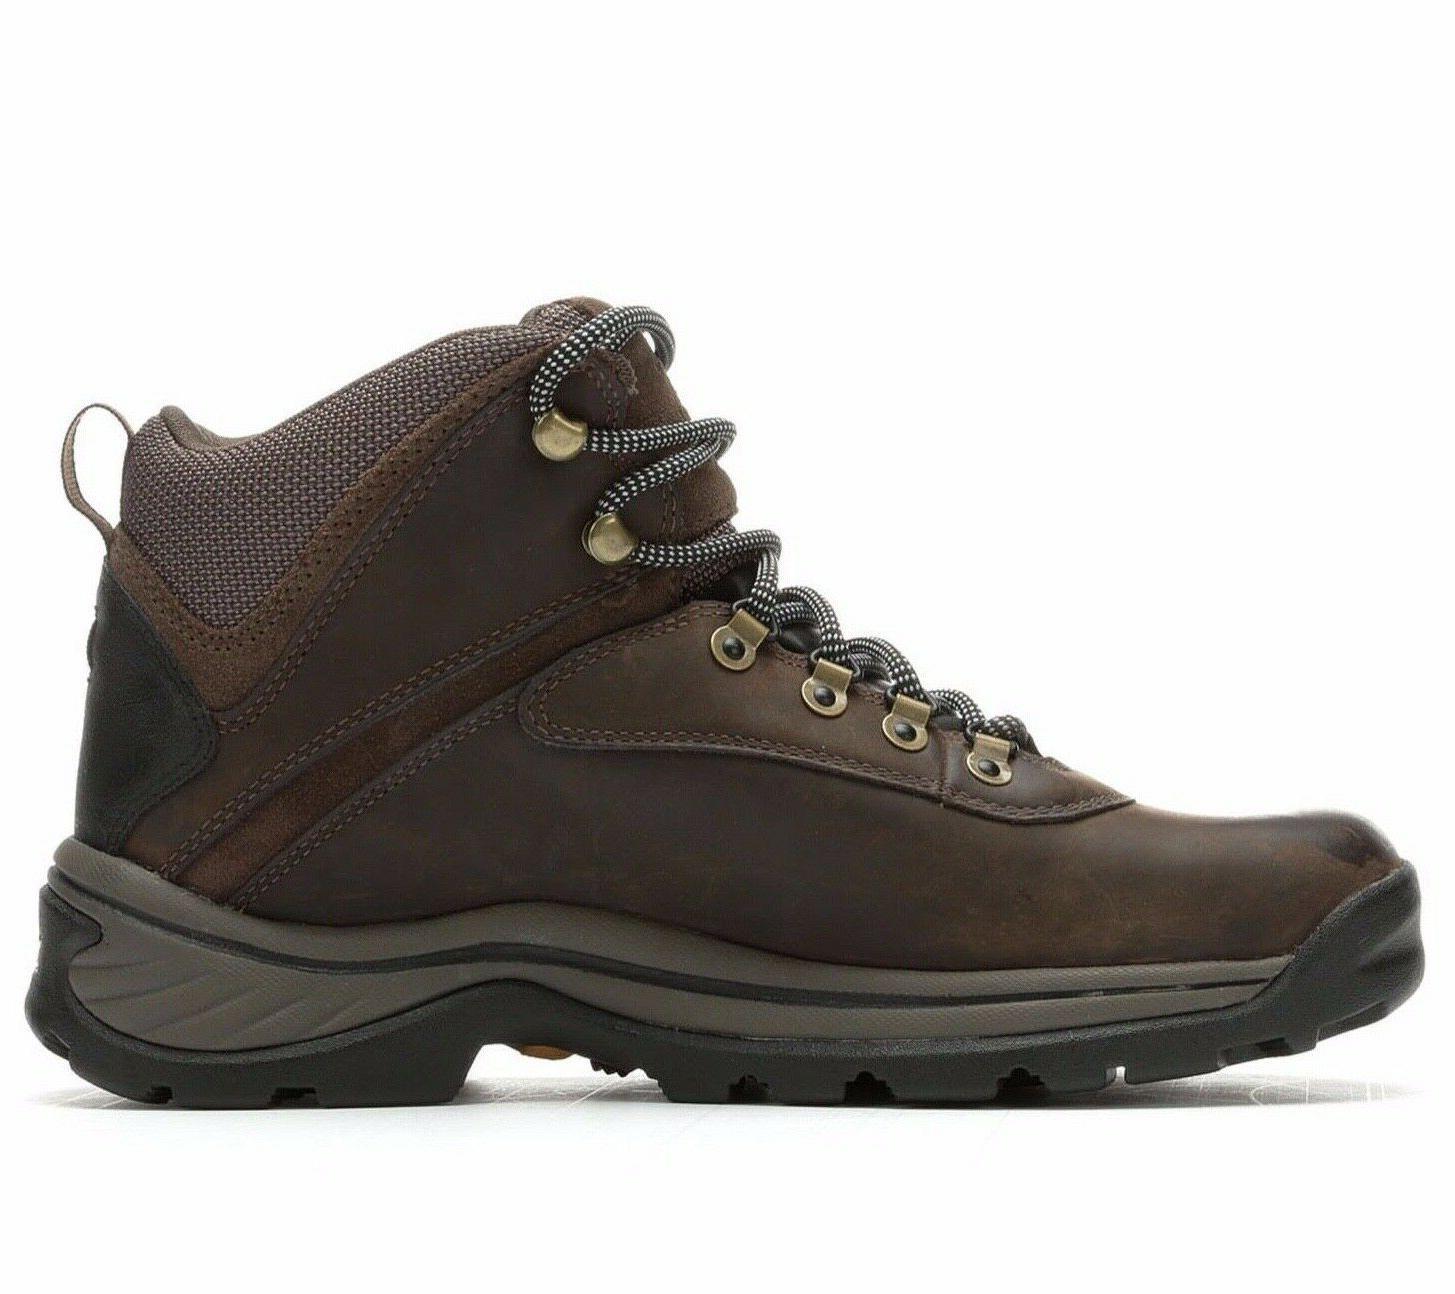 Timberland Waterproof Brown Leather Hiking 12135214